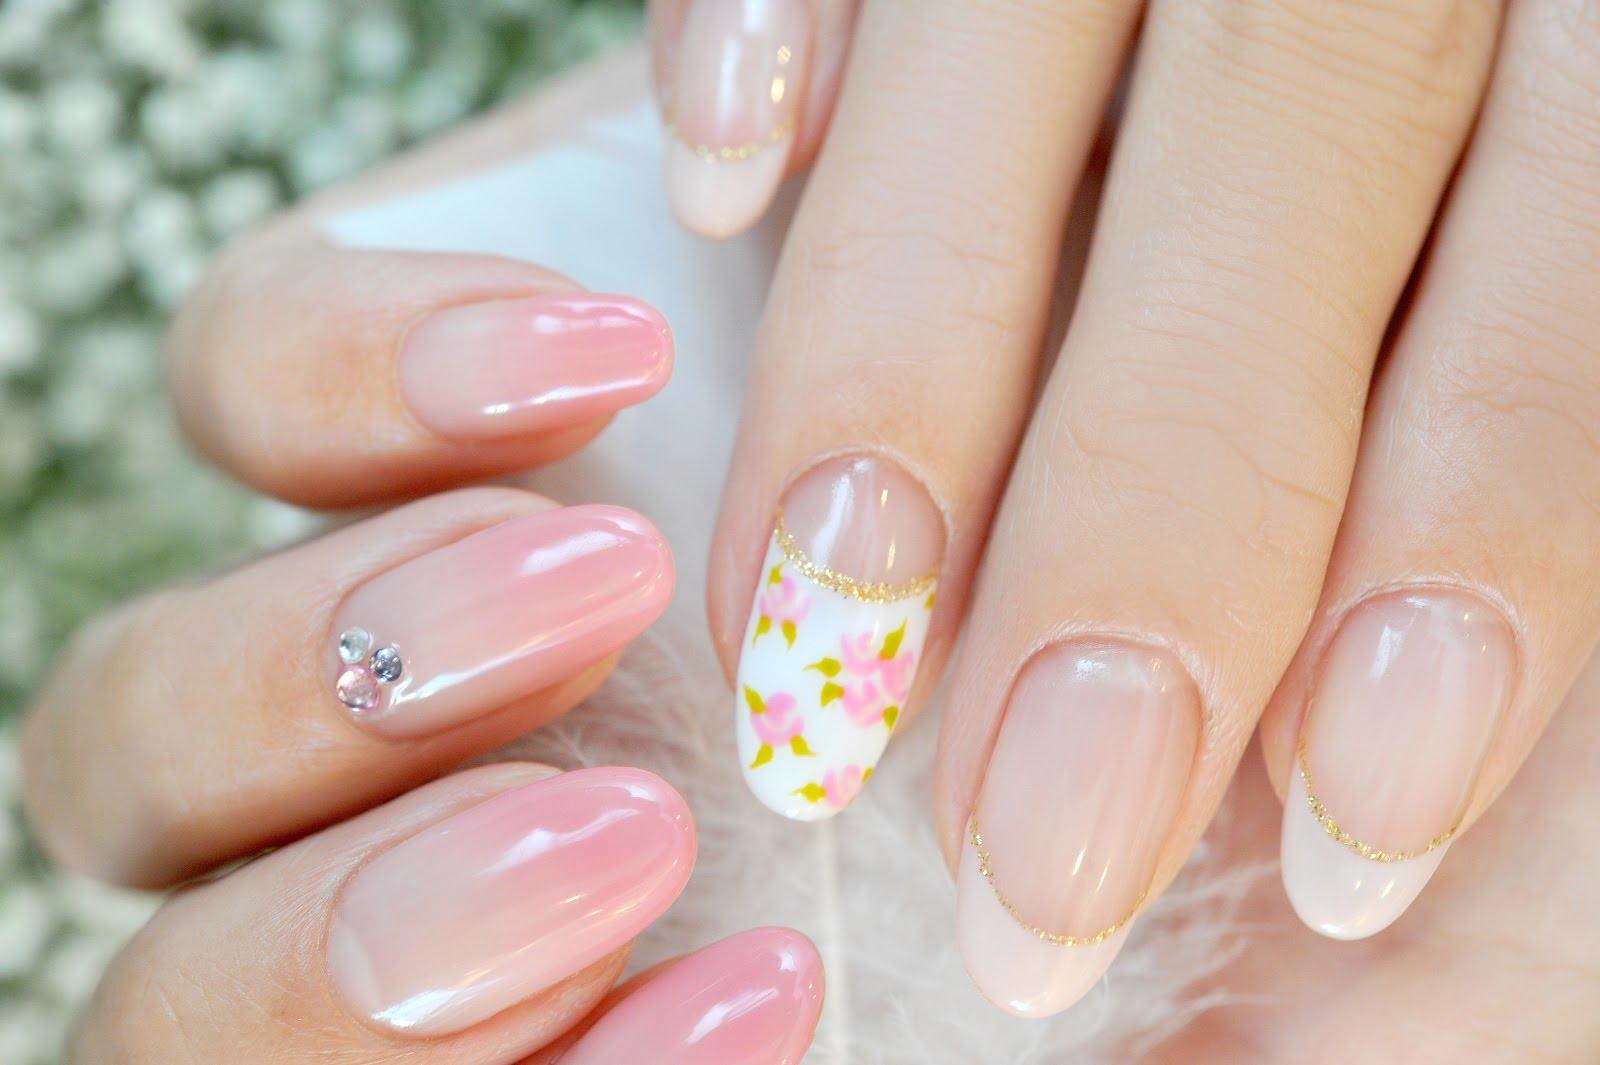 Unusual nails